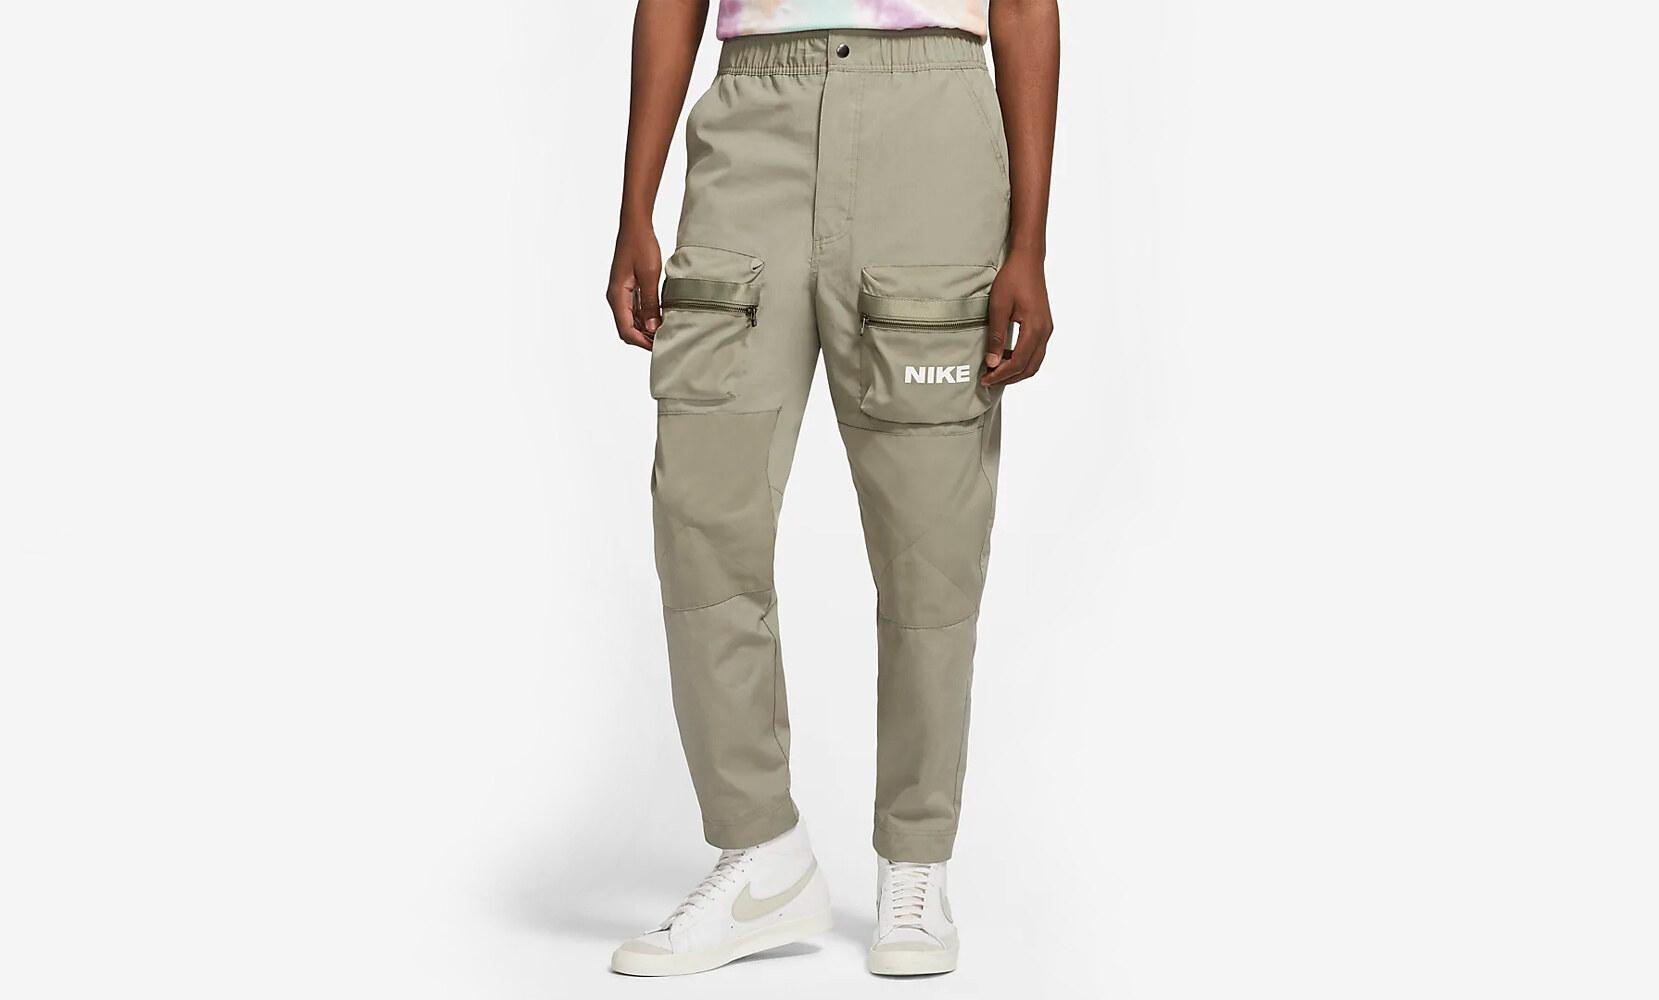 Pantaloni in tessuto Nike Sportswear City Made